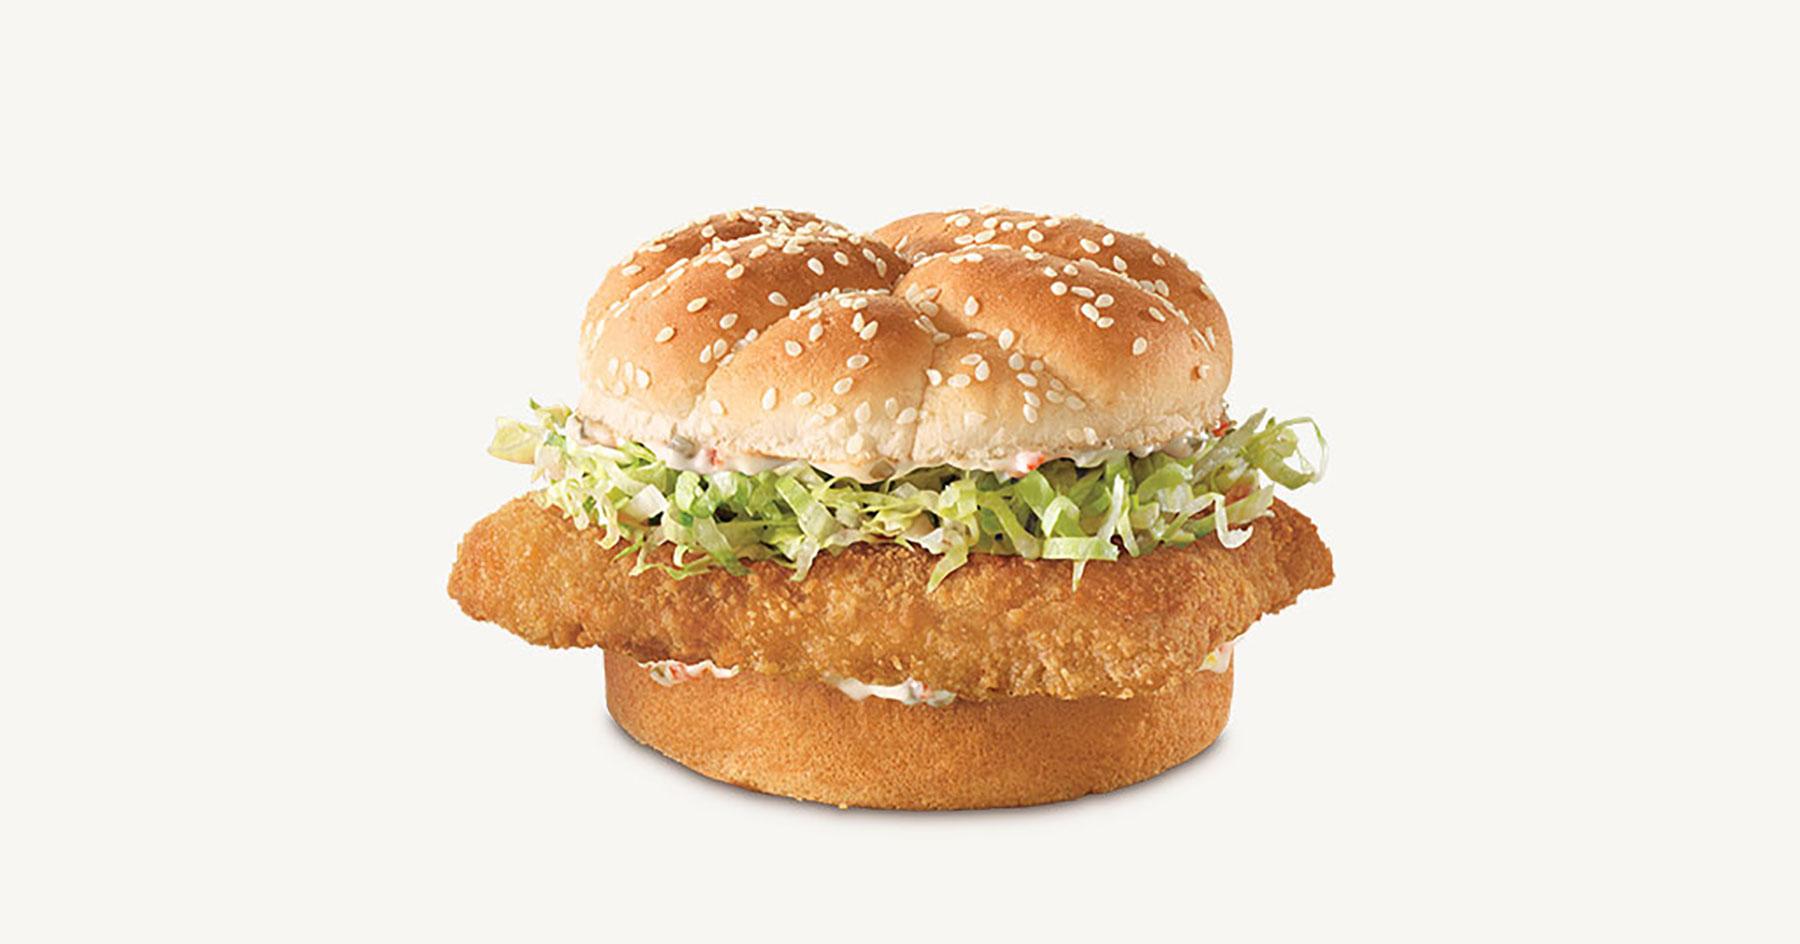 arby's crispy fish sandwich